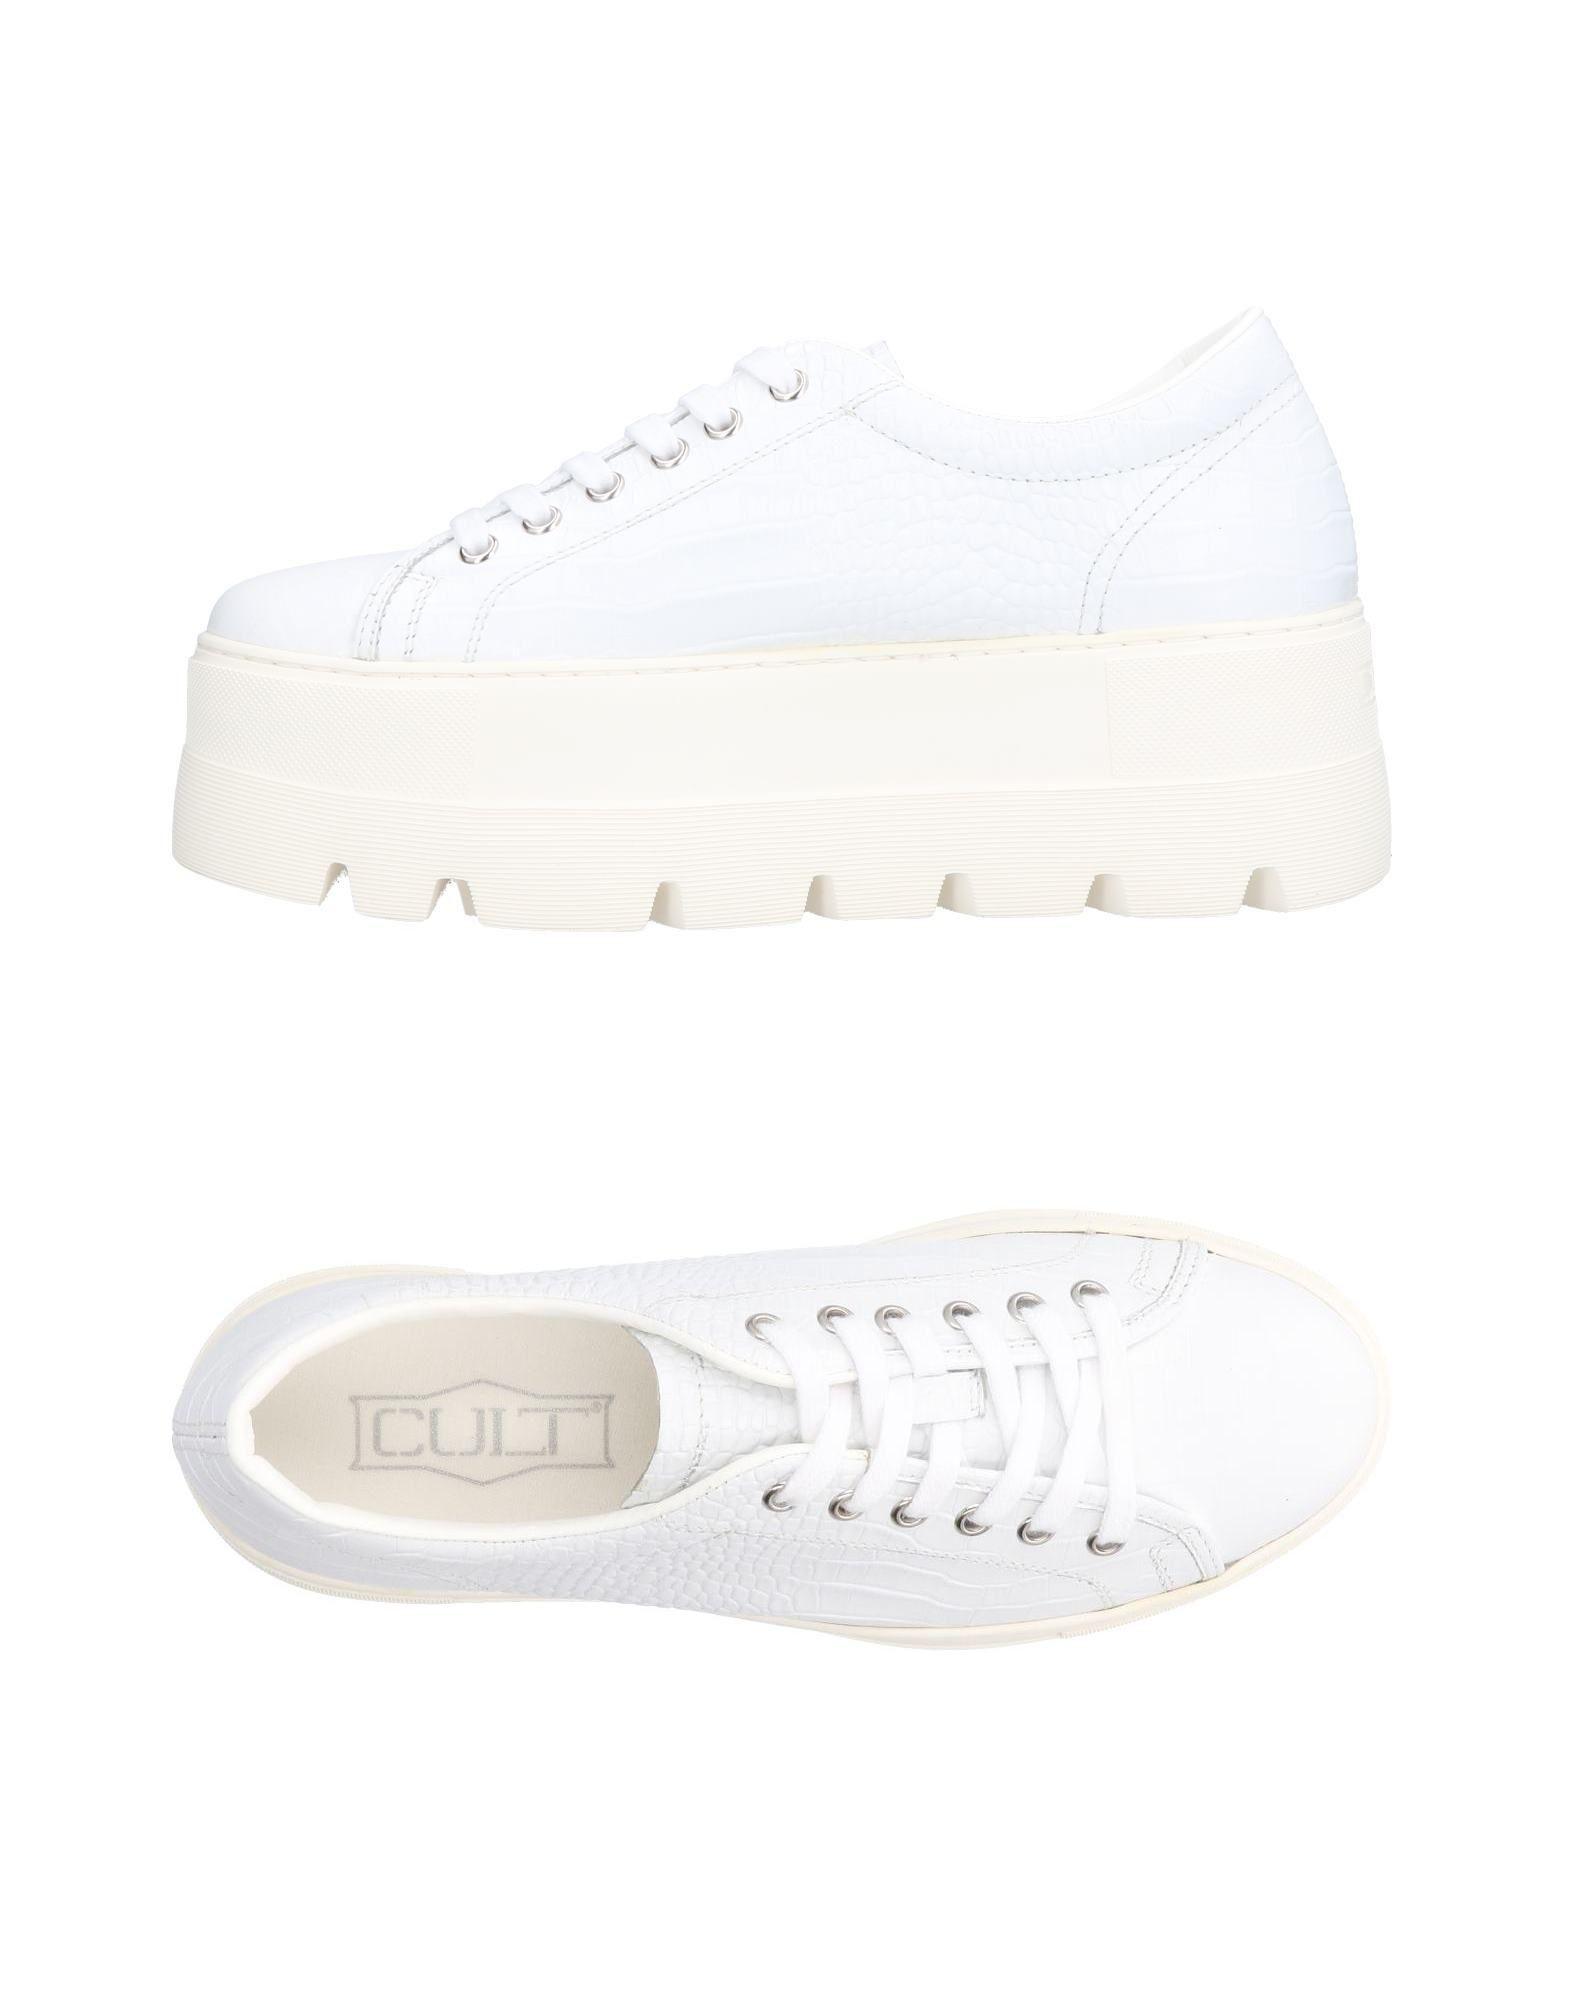 Moda Sneakers Cult Cult Sneakers Donna - 11473235XV 0a6da3